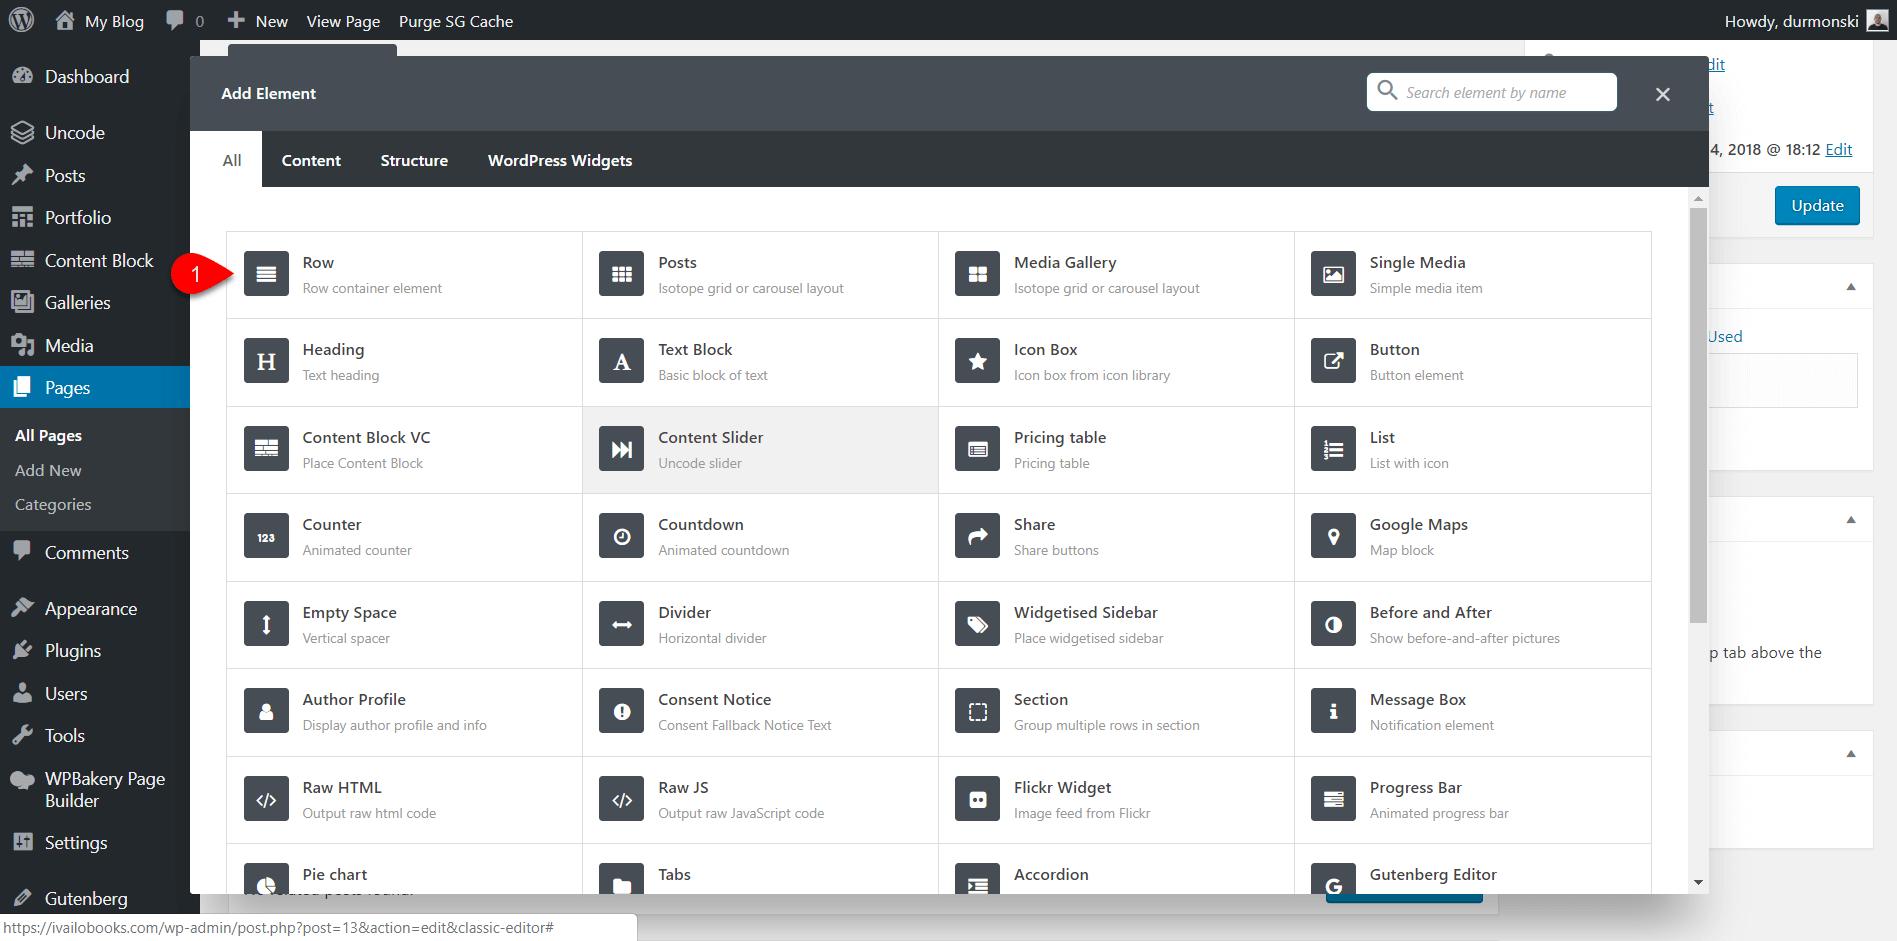 Uncode WordPress Theme Settings 22